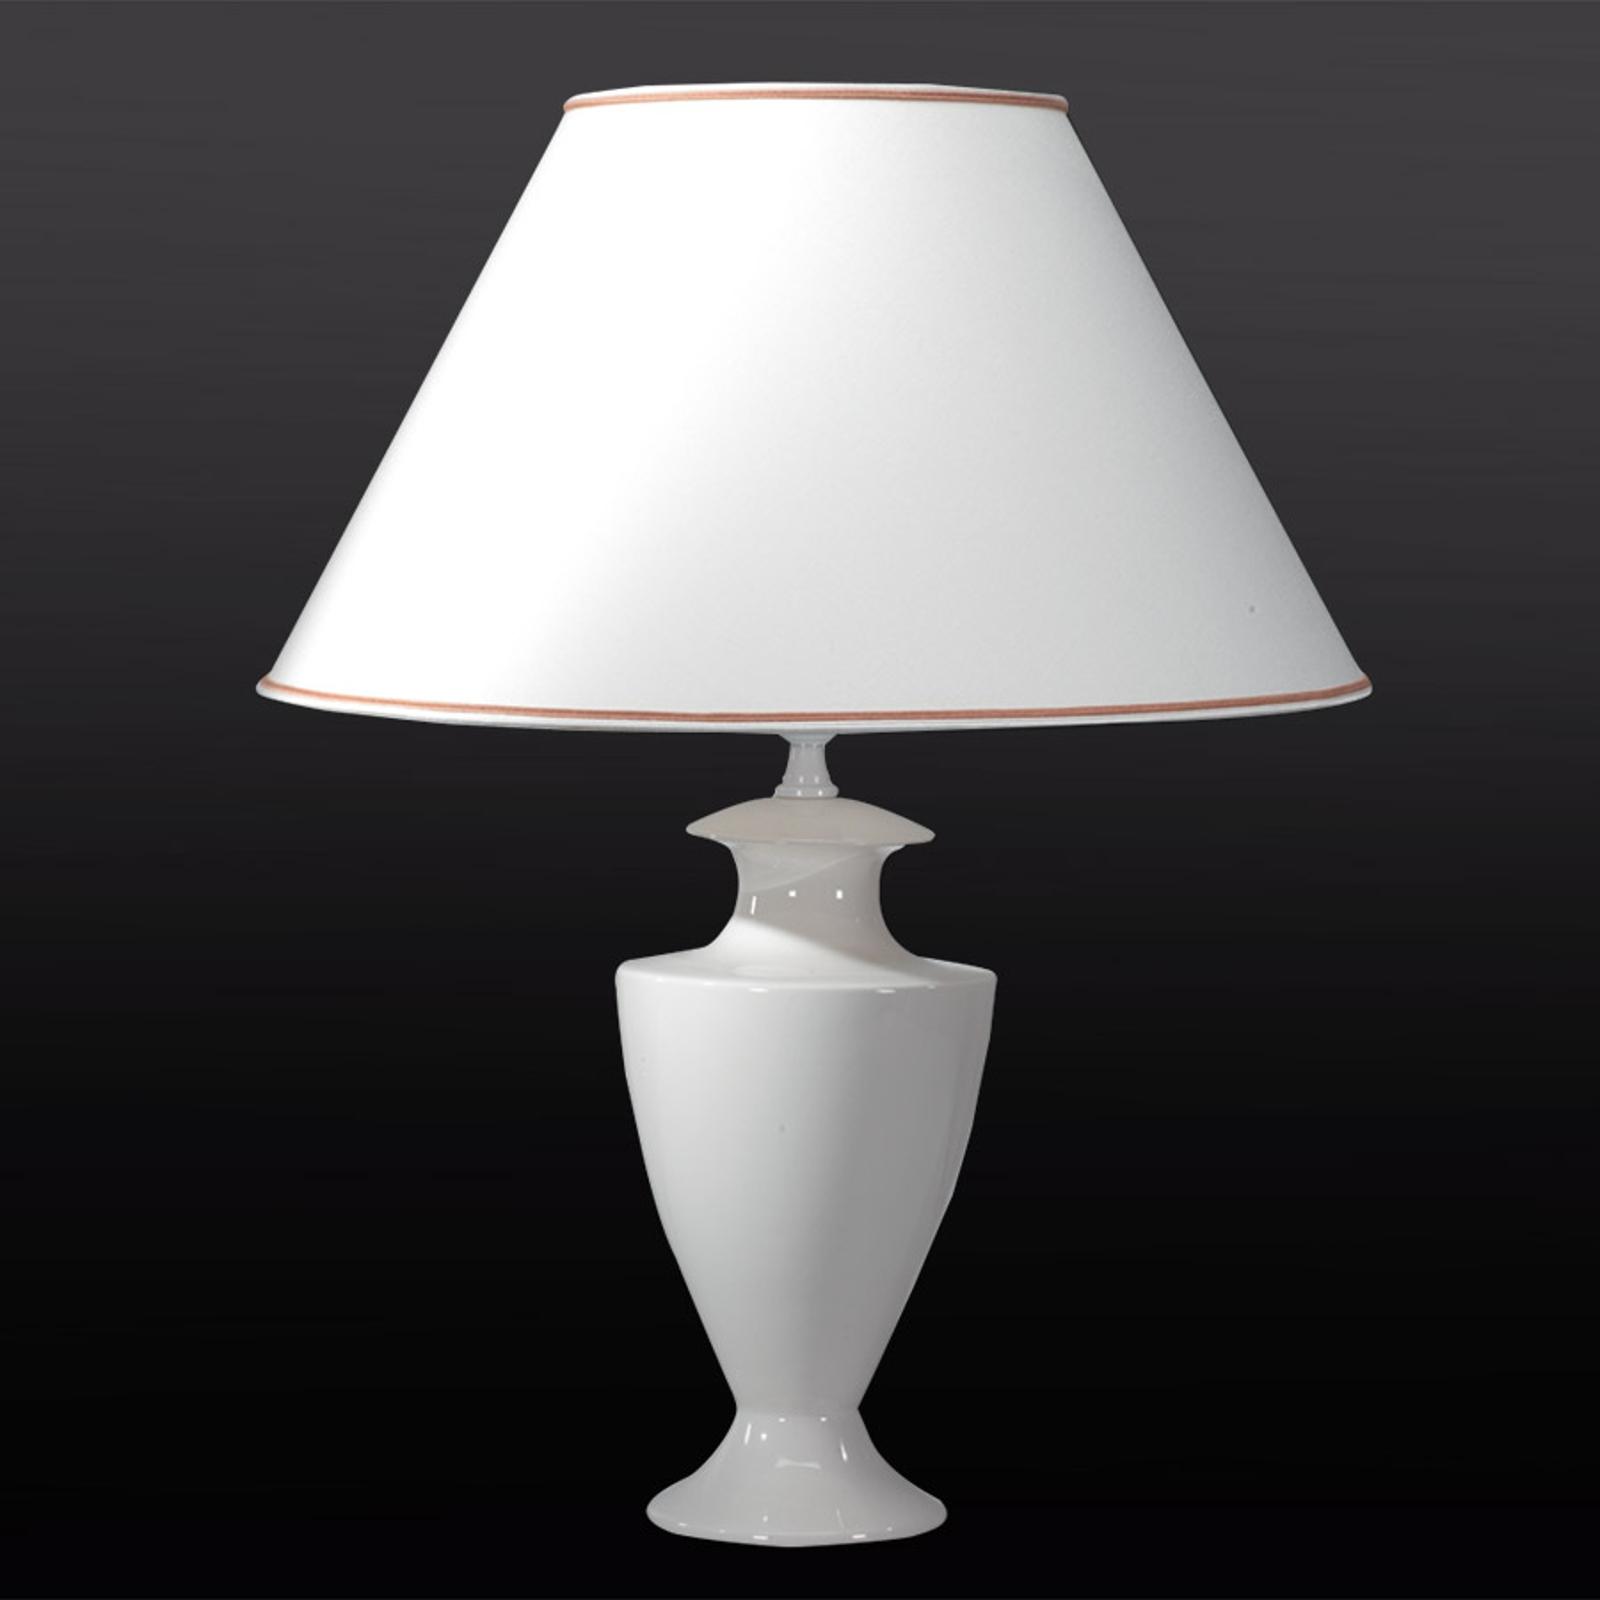 Lampa stołowa ADA CRAQUELET, 70 cm